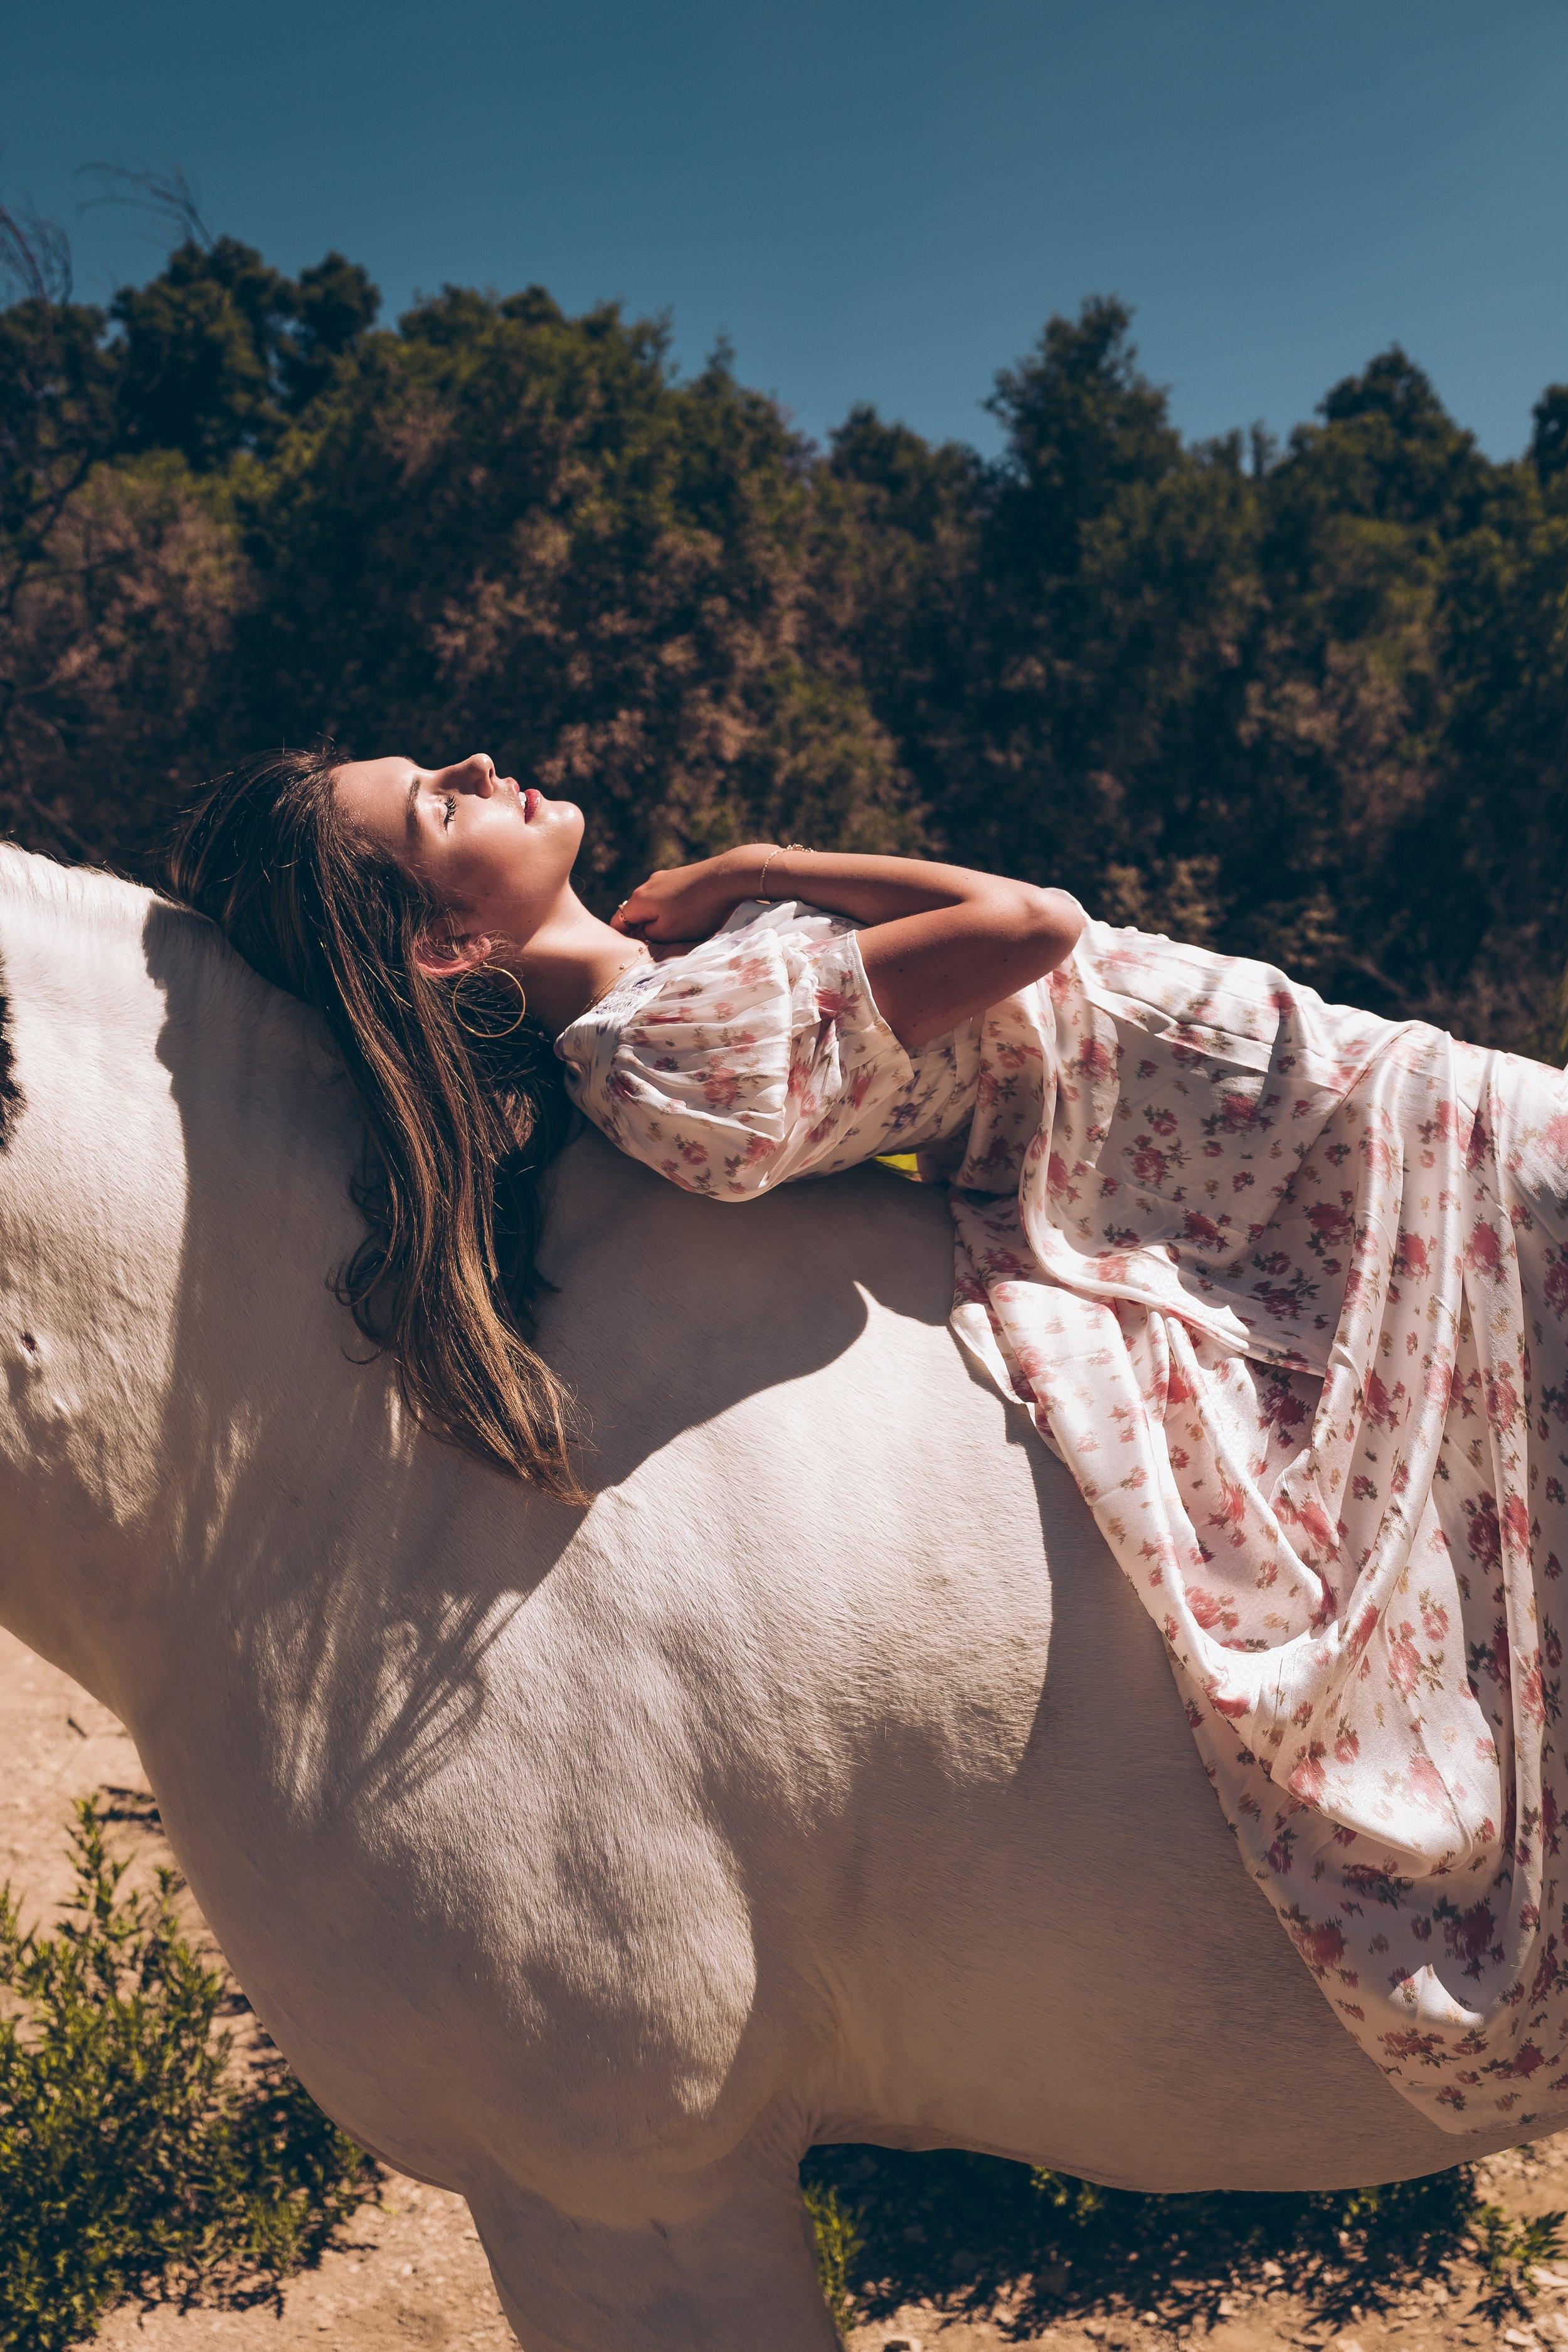 julia friedman love shack fancy dress malibu gems horseback